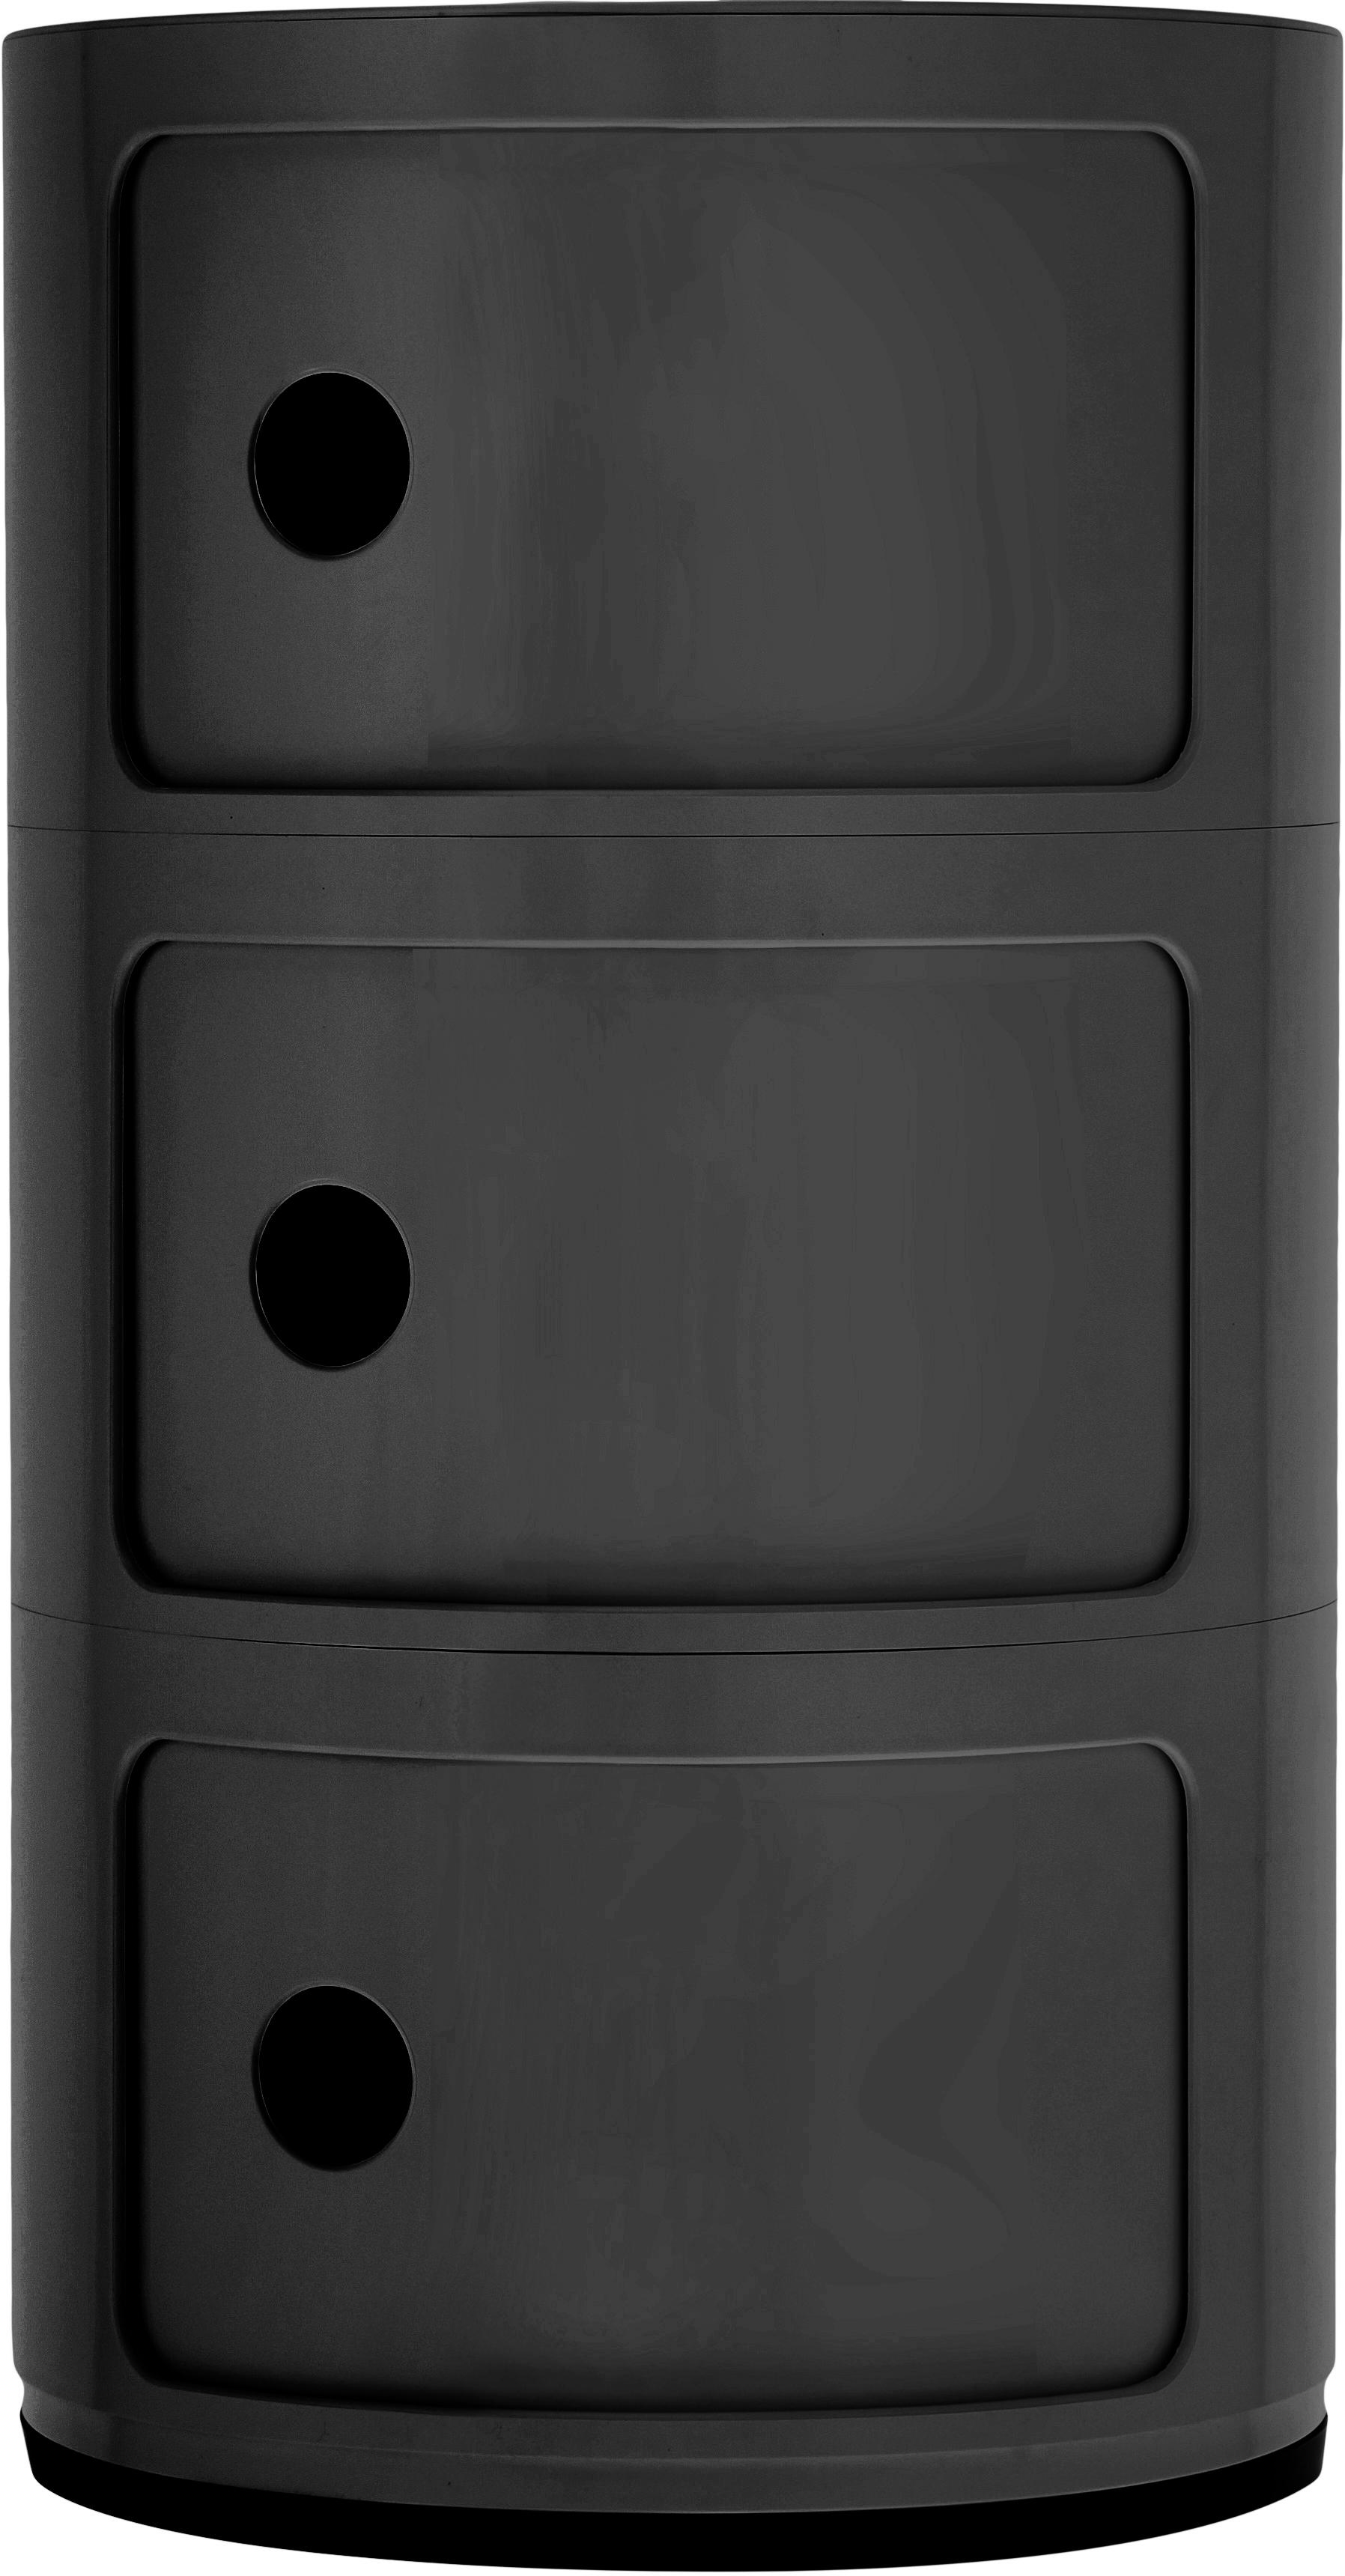 Design Container Componibile, Kunststoff (ABS), lackiert, Schwarz, matt, Ø 32 x H 59 cm